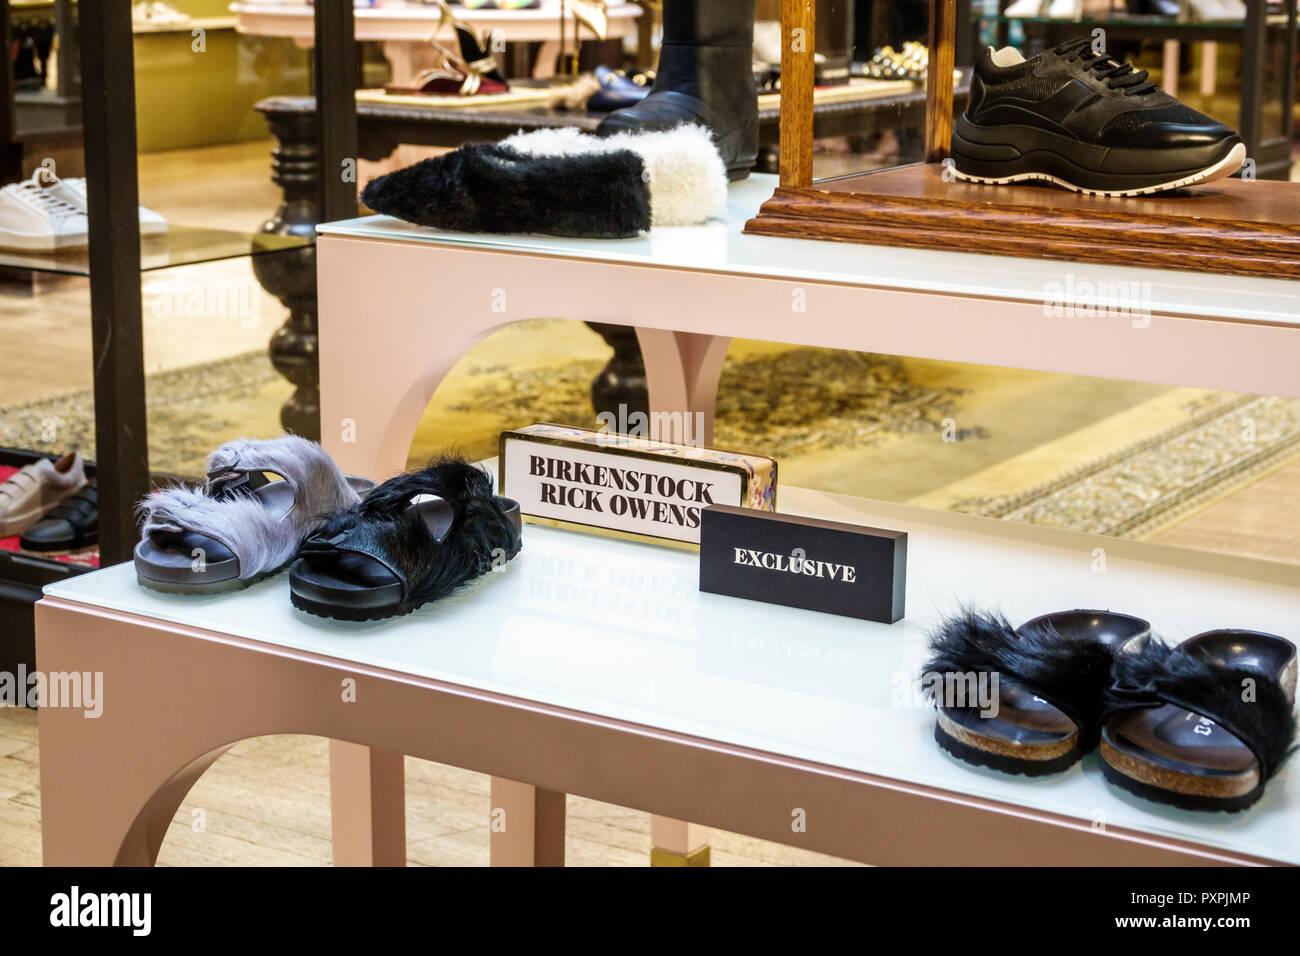 fa0f3c5733c London England United Kingdom Great Britain Soho Liberty Department Store  shopping luxury brands upmarket women s shoes designer Birkenstock Rick Owen